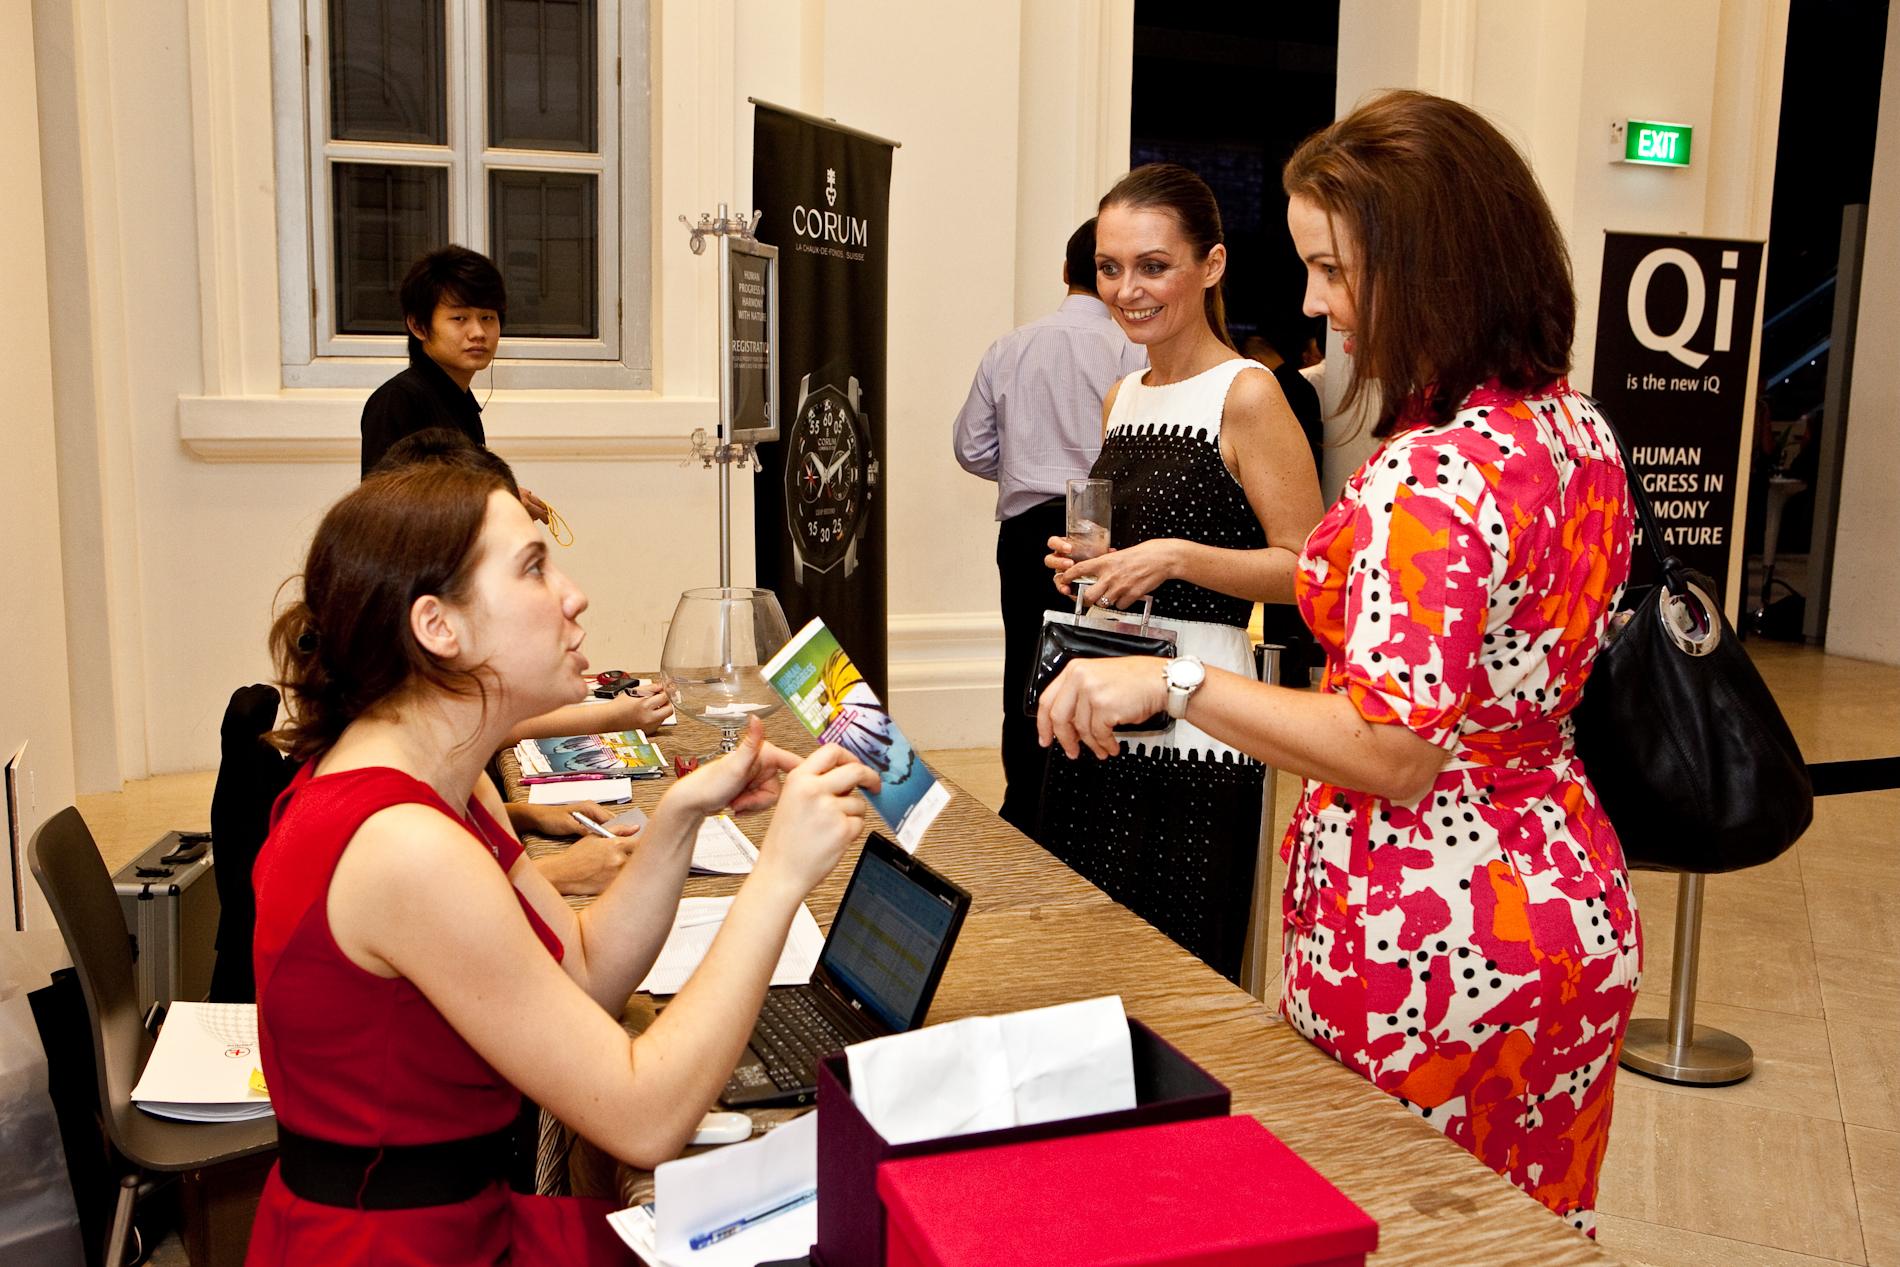 qi-global-2009-sustaible-design-singapore-077.jpg